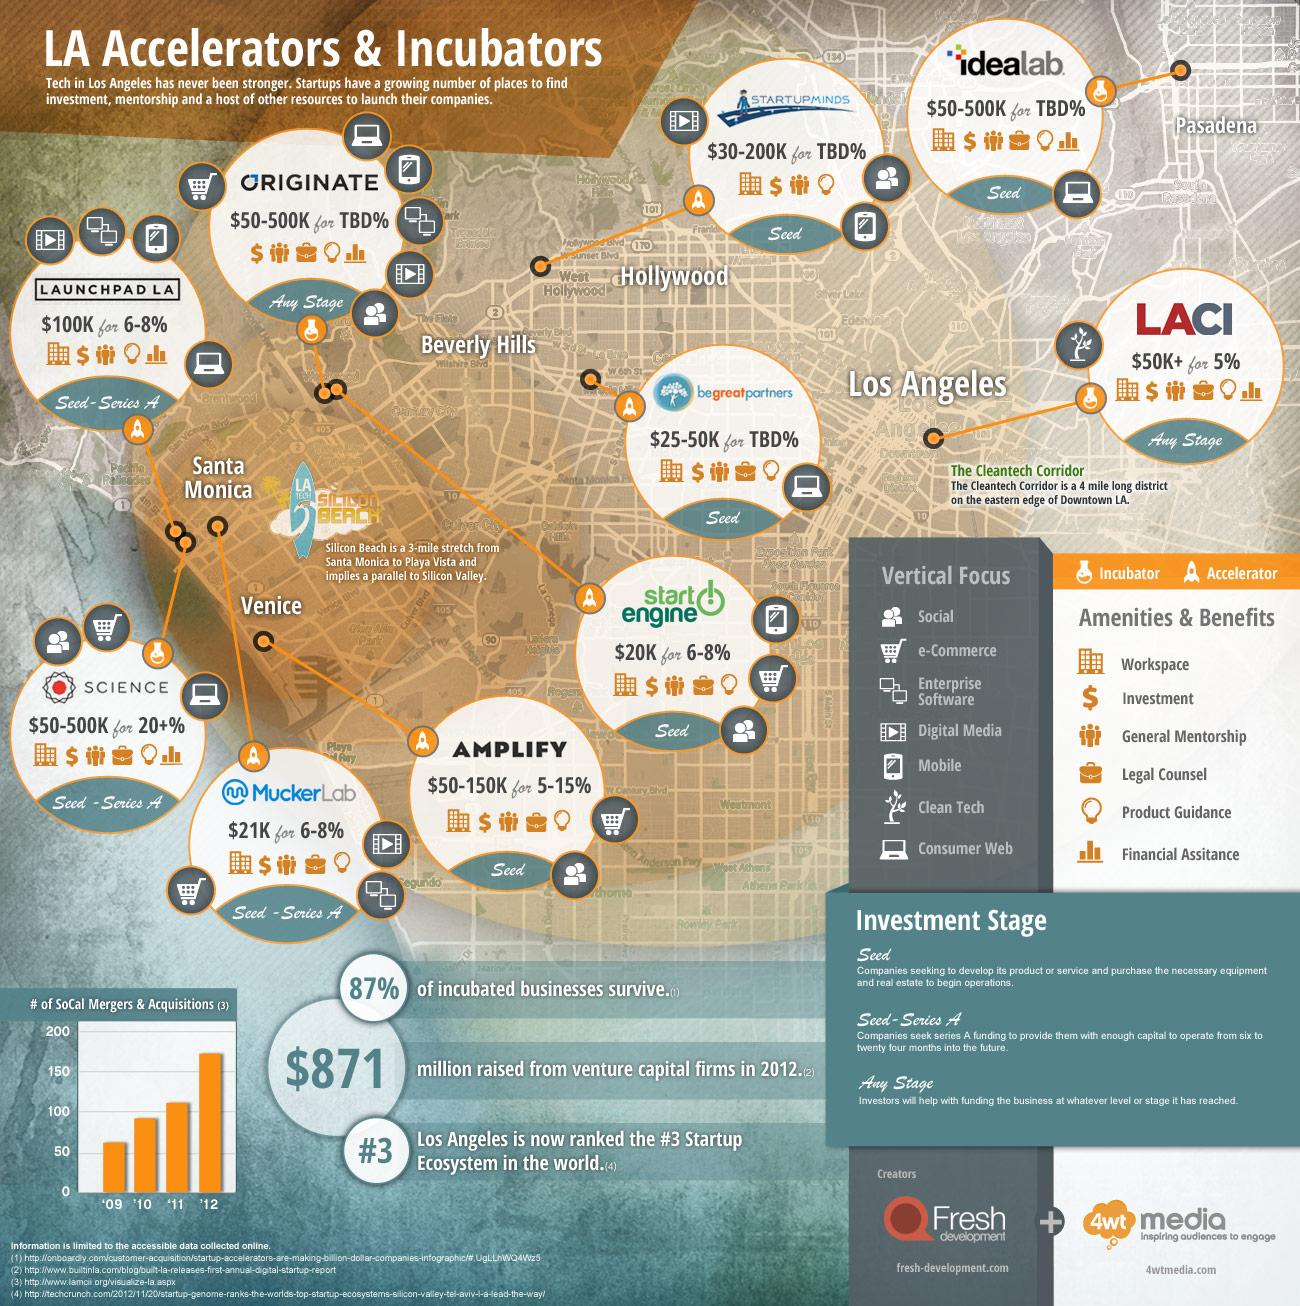 LA-Accelerators-and-Incubators.2